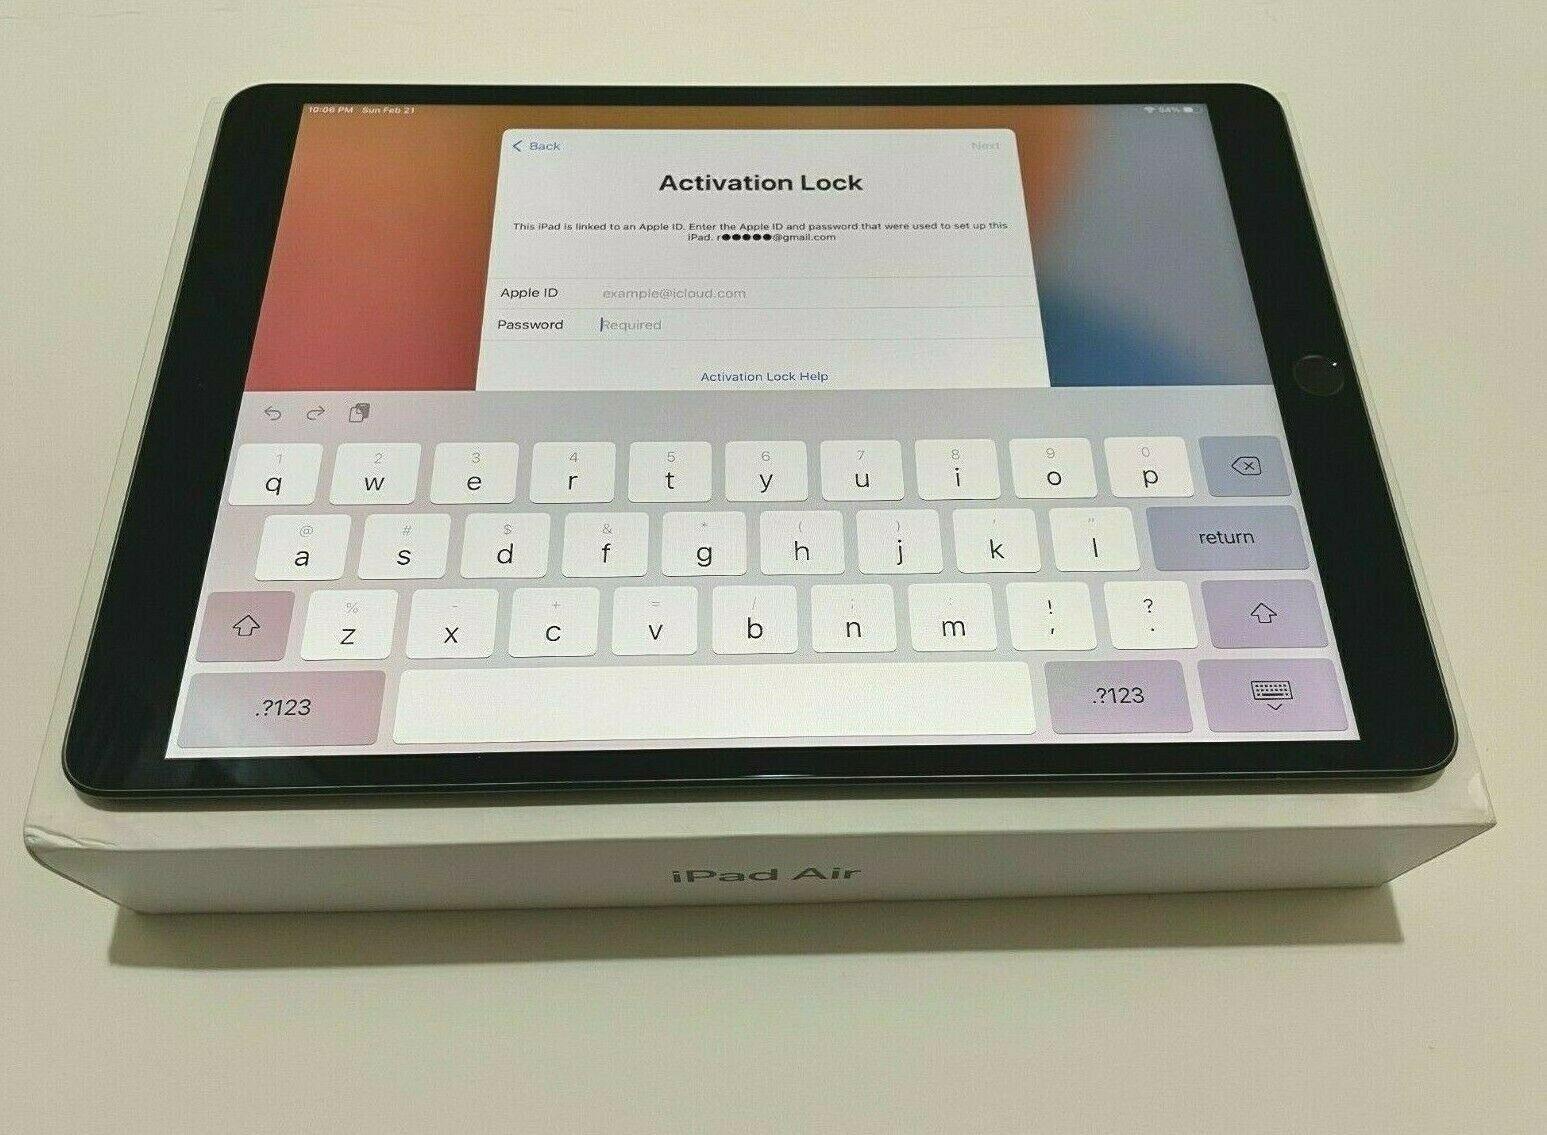 Apple IPad Air 3rd Generation 64GB, Wi-Fi, 10.5in - Space Gray - $239.99